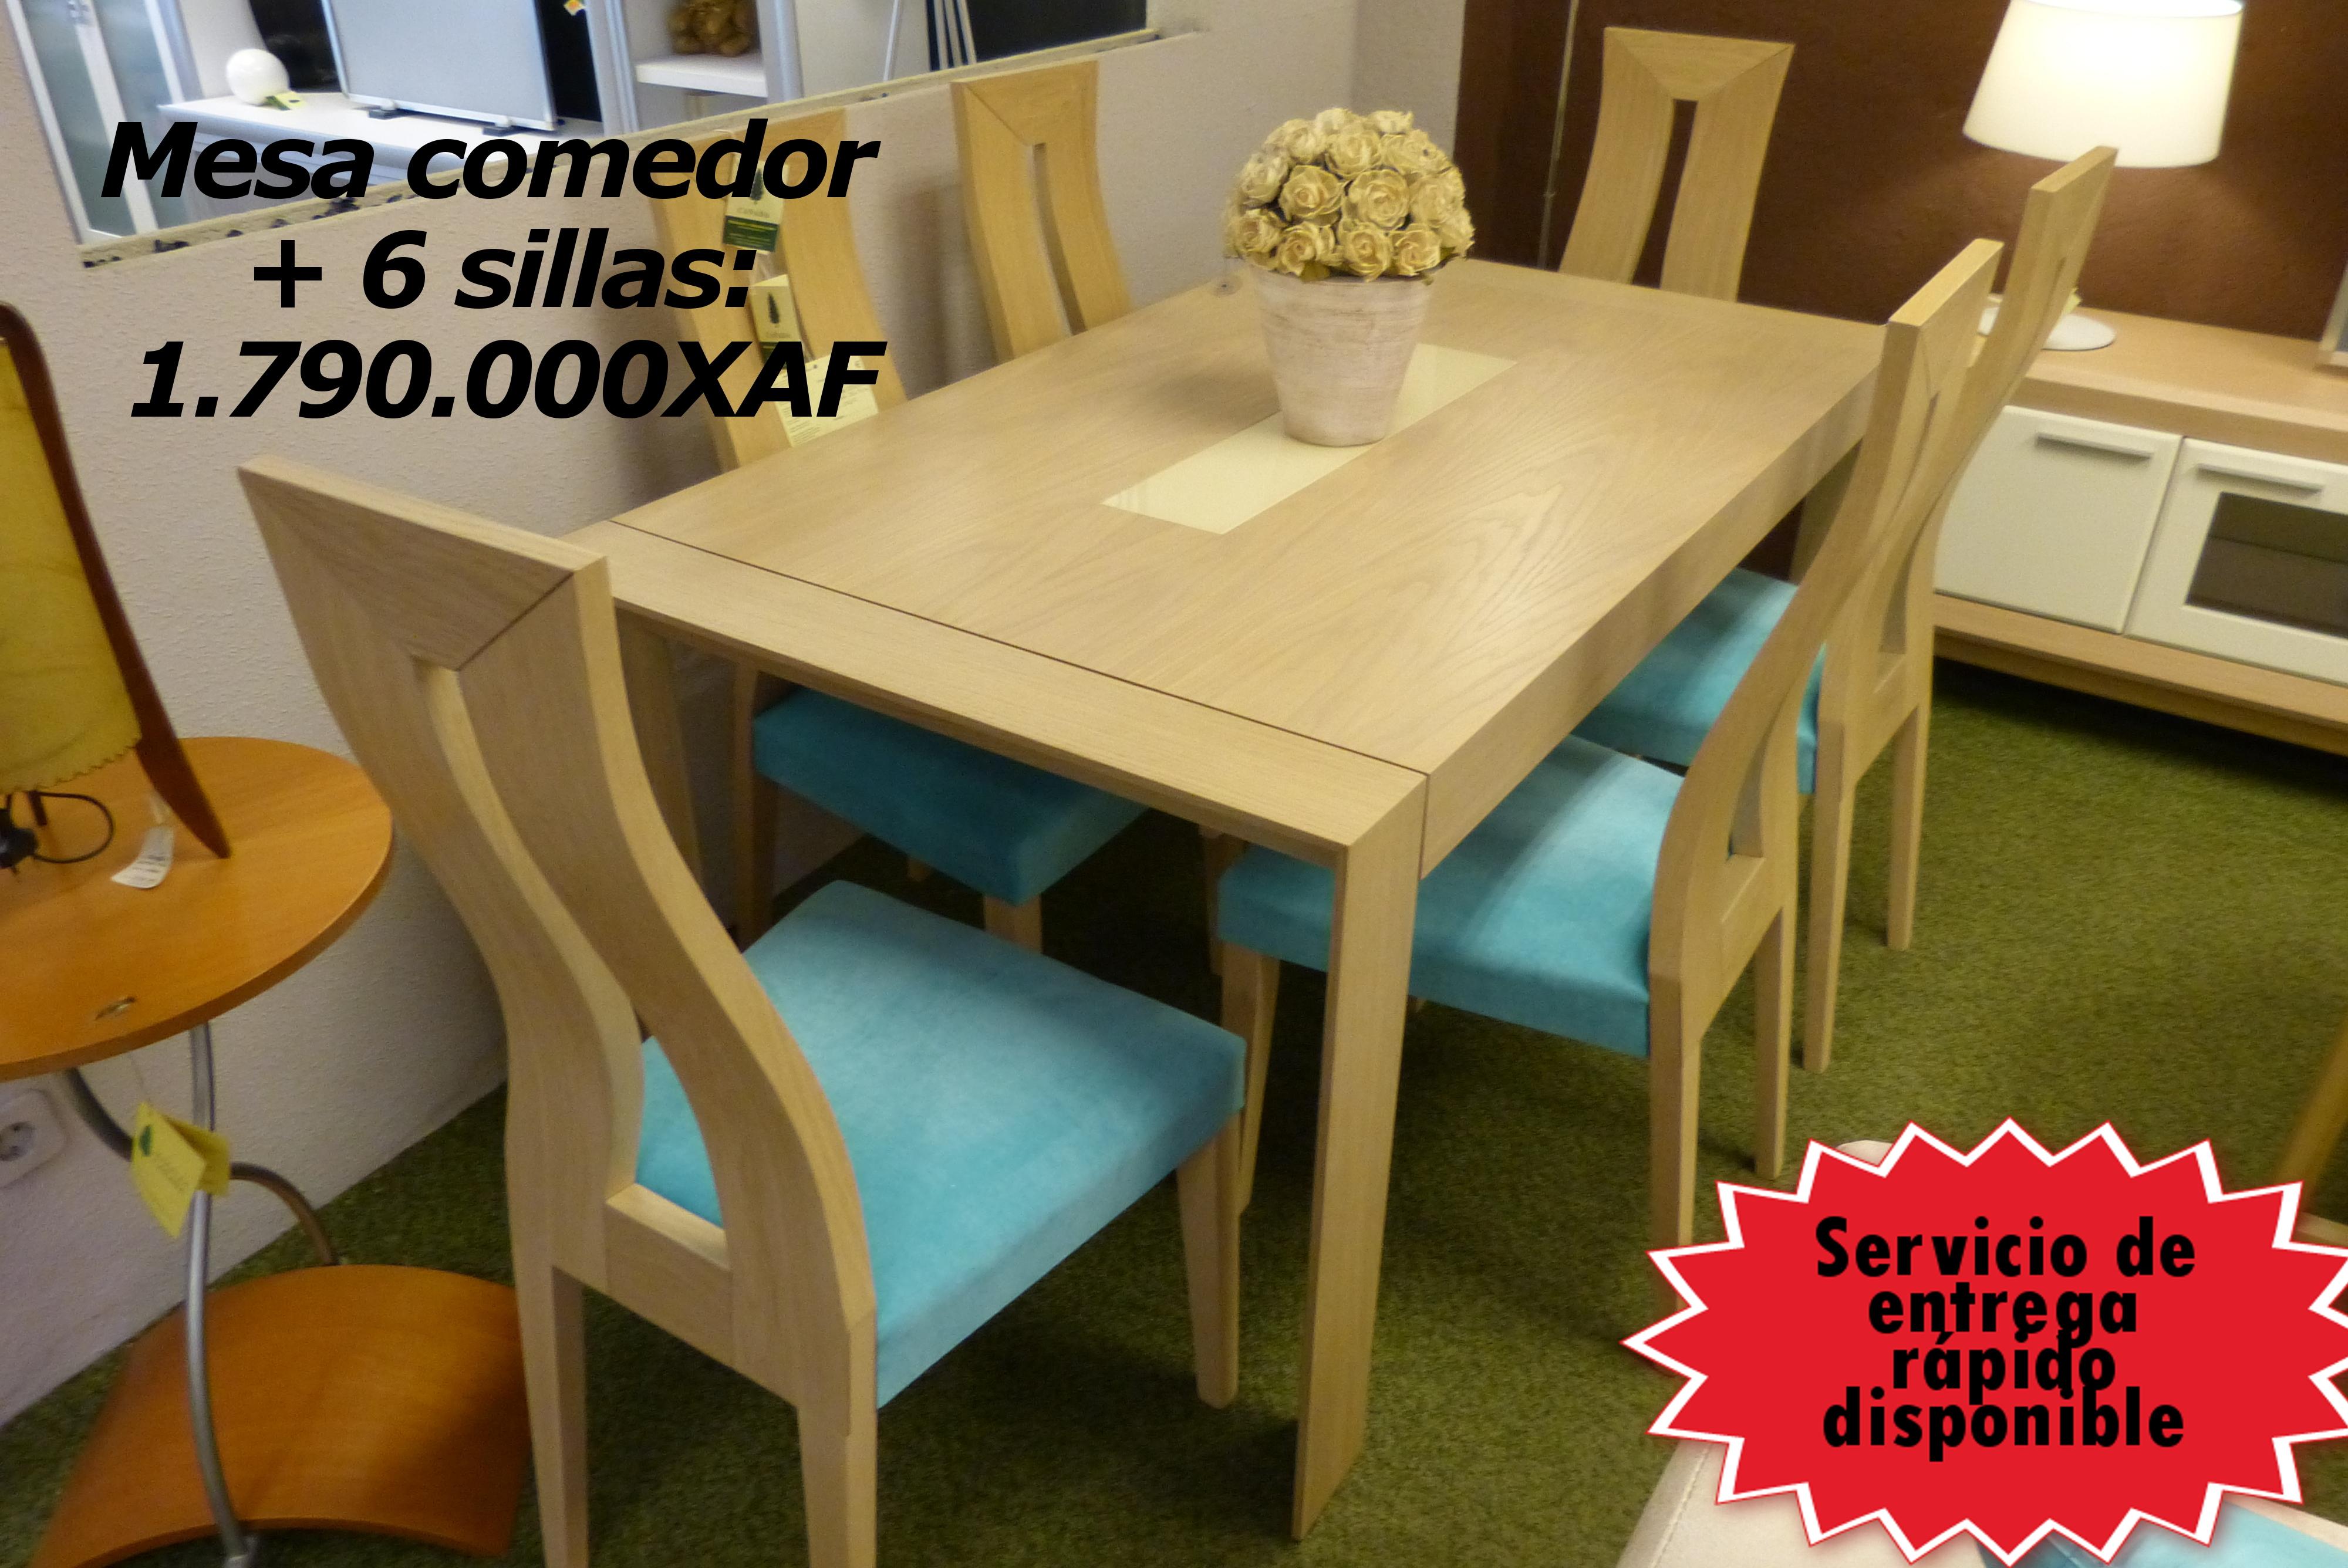 Mesa comedor + 6 sillas - Muebles Toscana Guinea